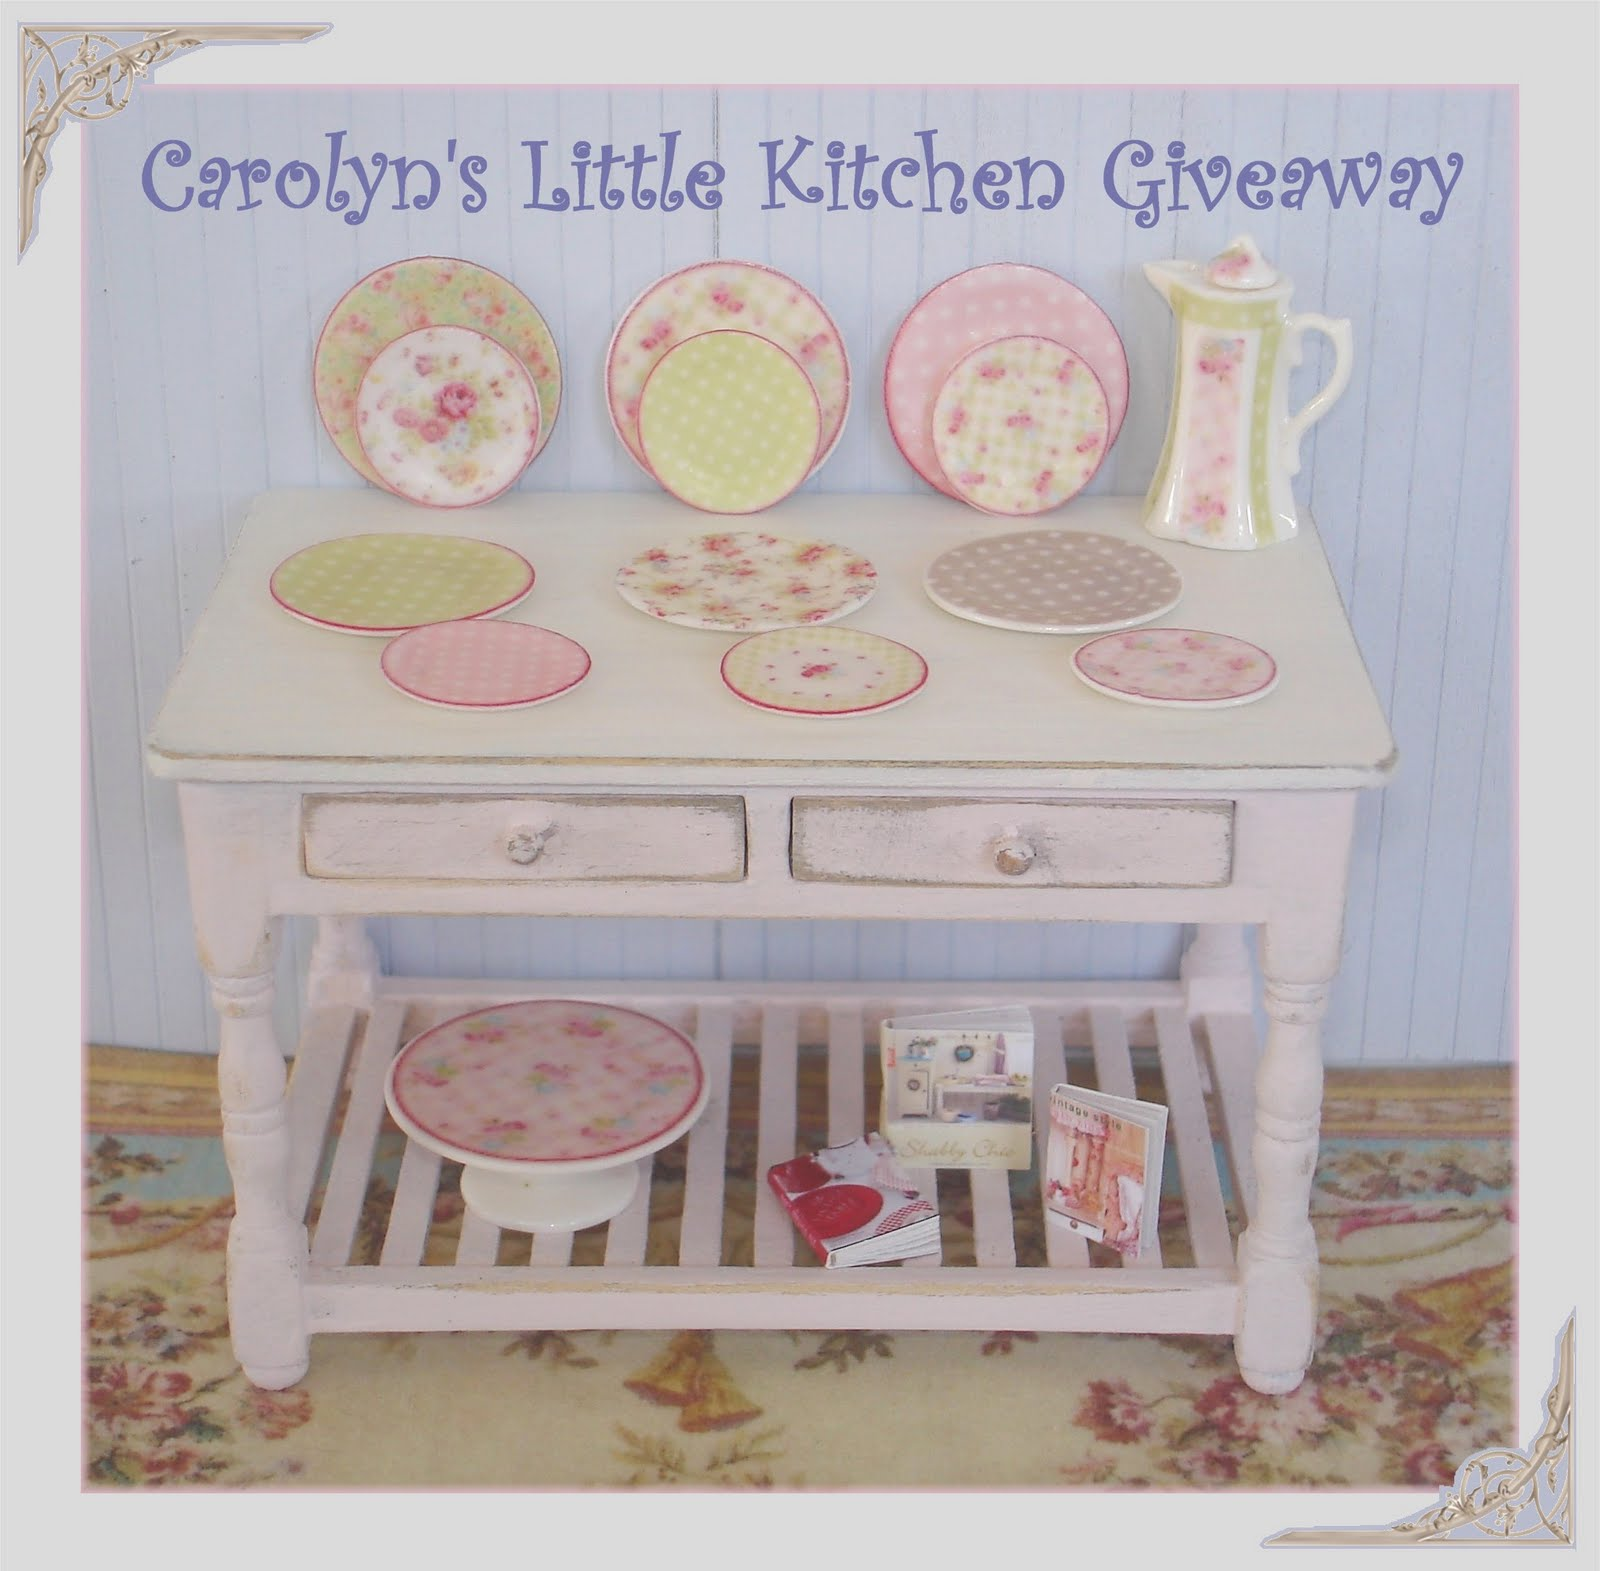 Carolyn's Little Kitchen: August 2010